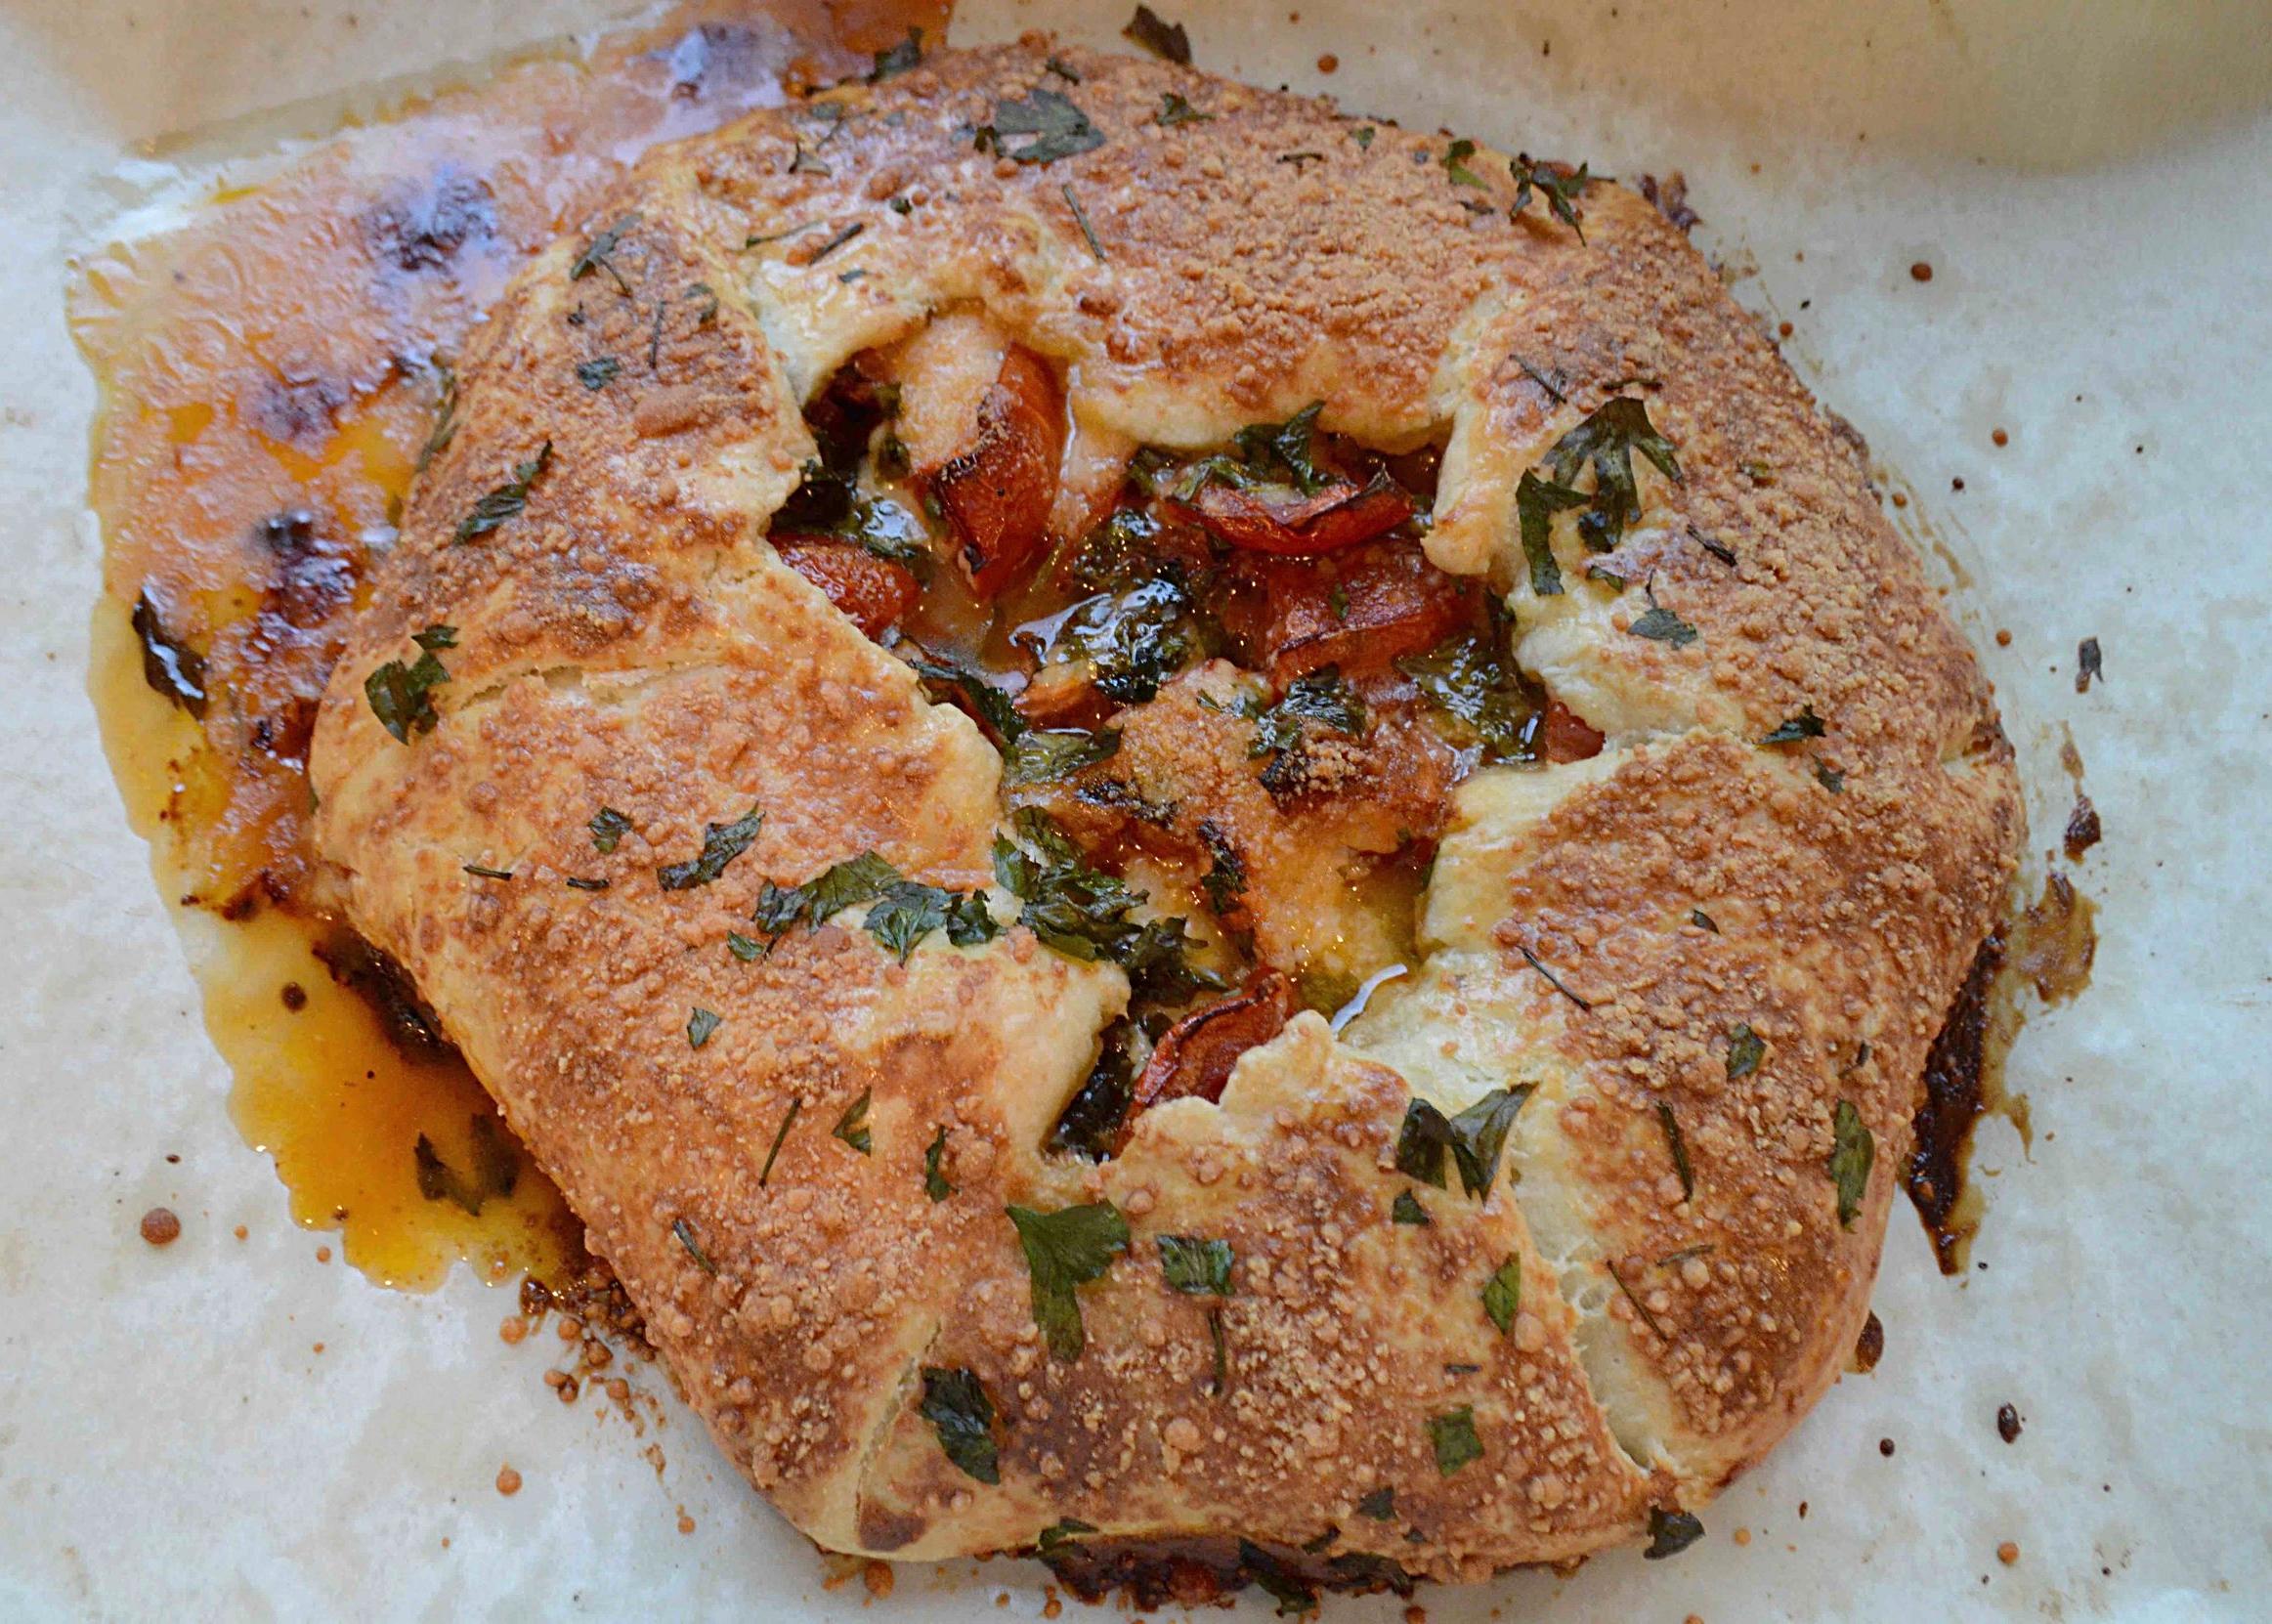 Rustic Roasted Tomato Tart